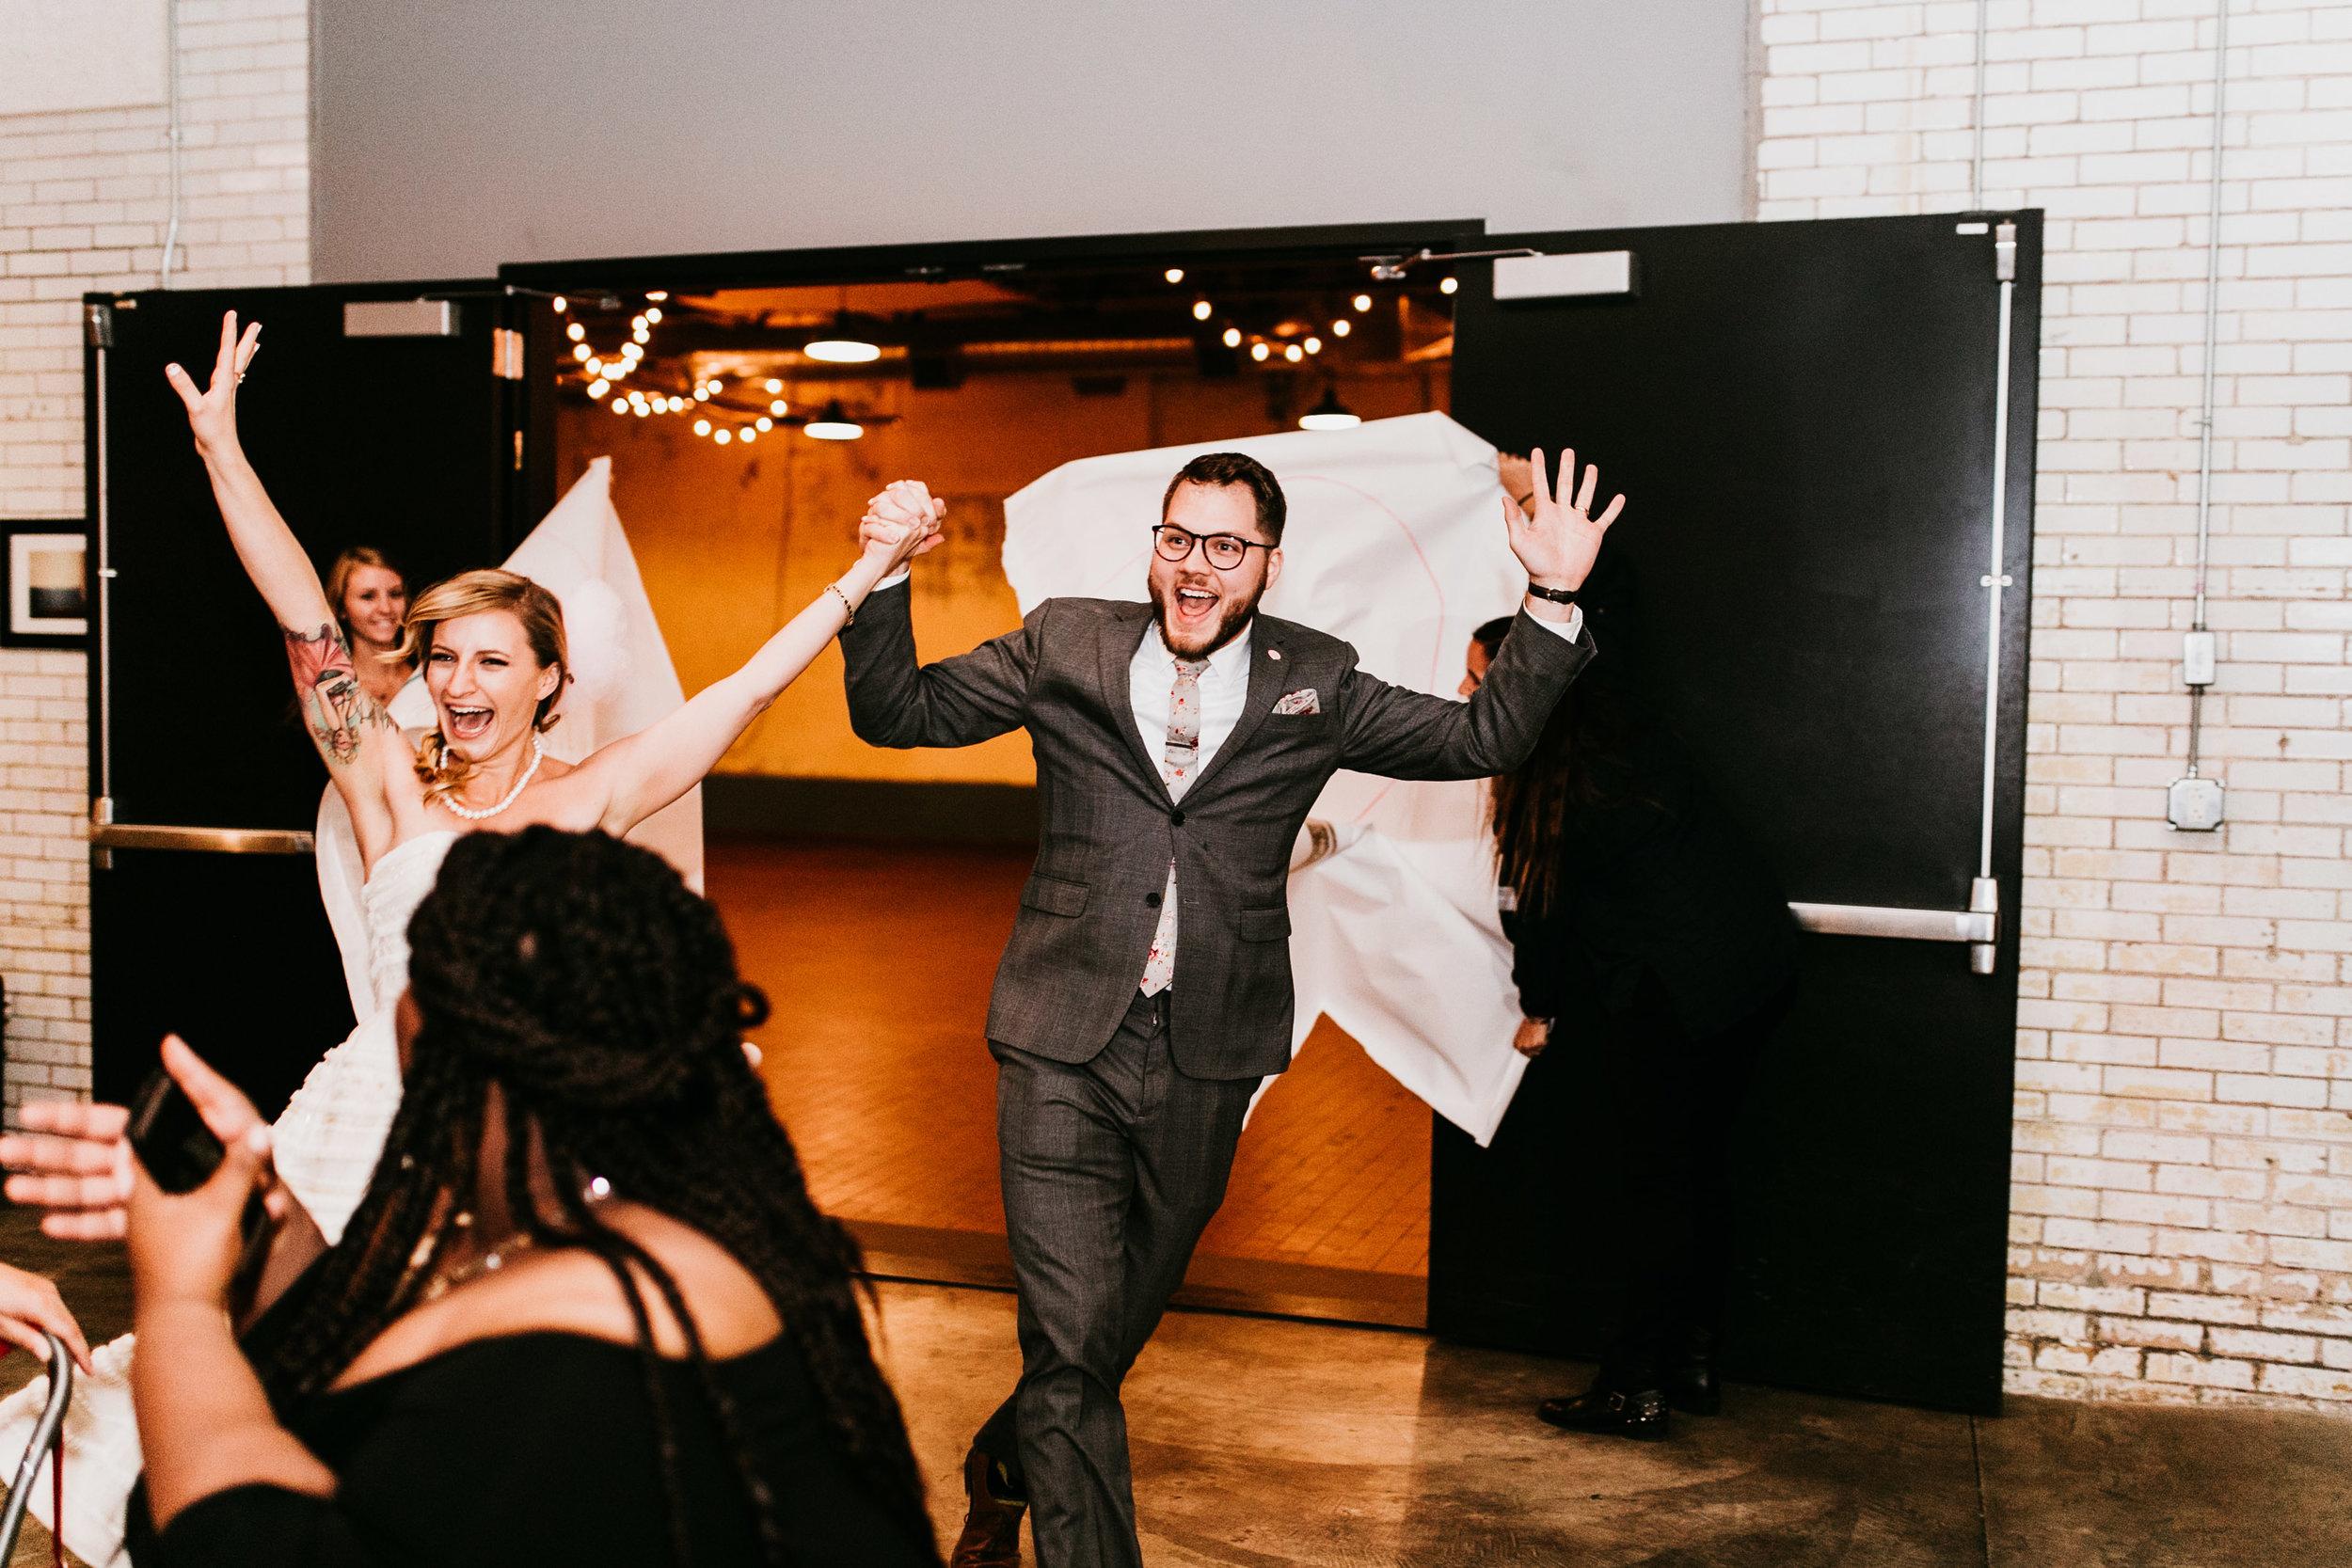 uprooted-traveler-tradditional-vs-vegas-wedding-sign-vegan.jpg